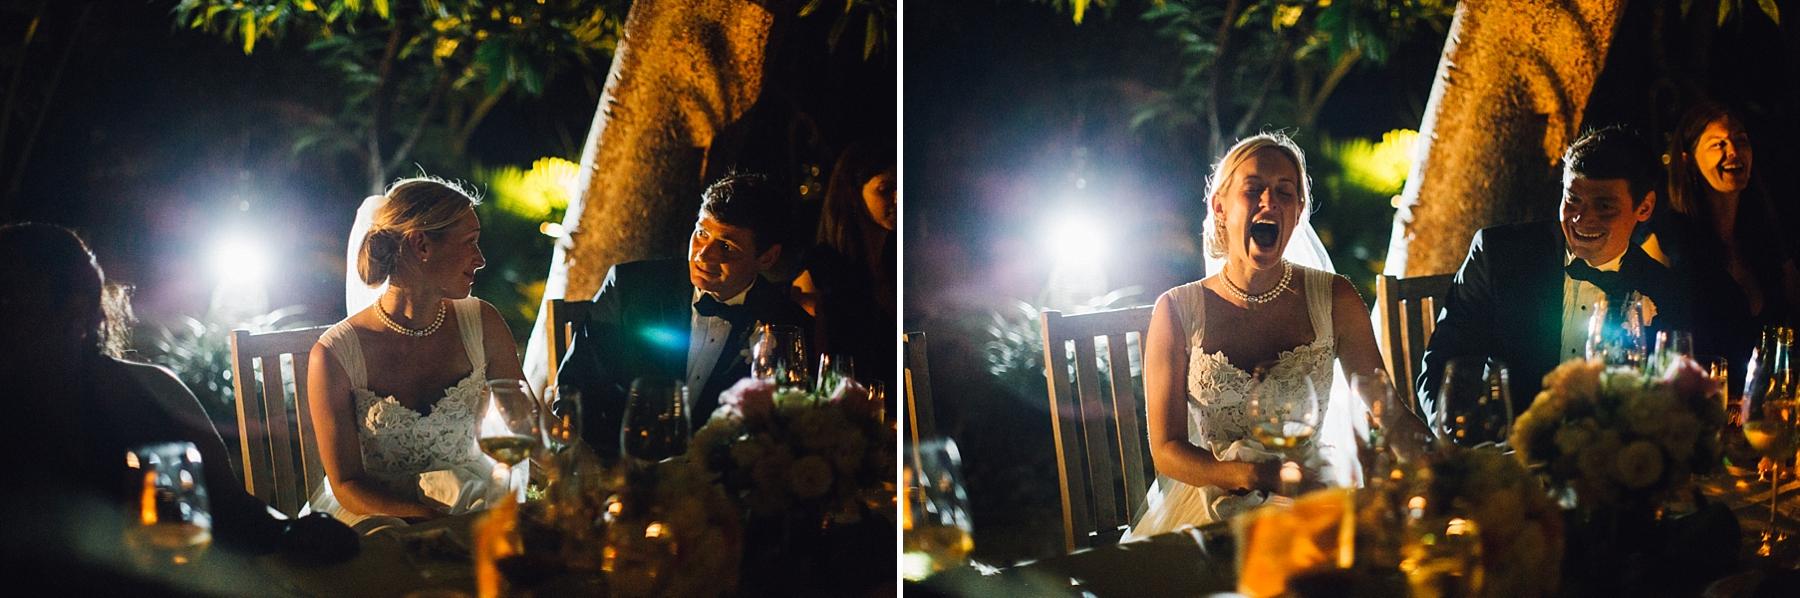 intimate-destination-wedding-beach-moments-harbour-island_0085.jpg